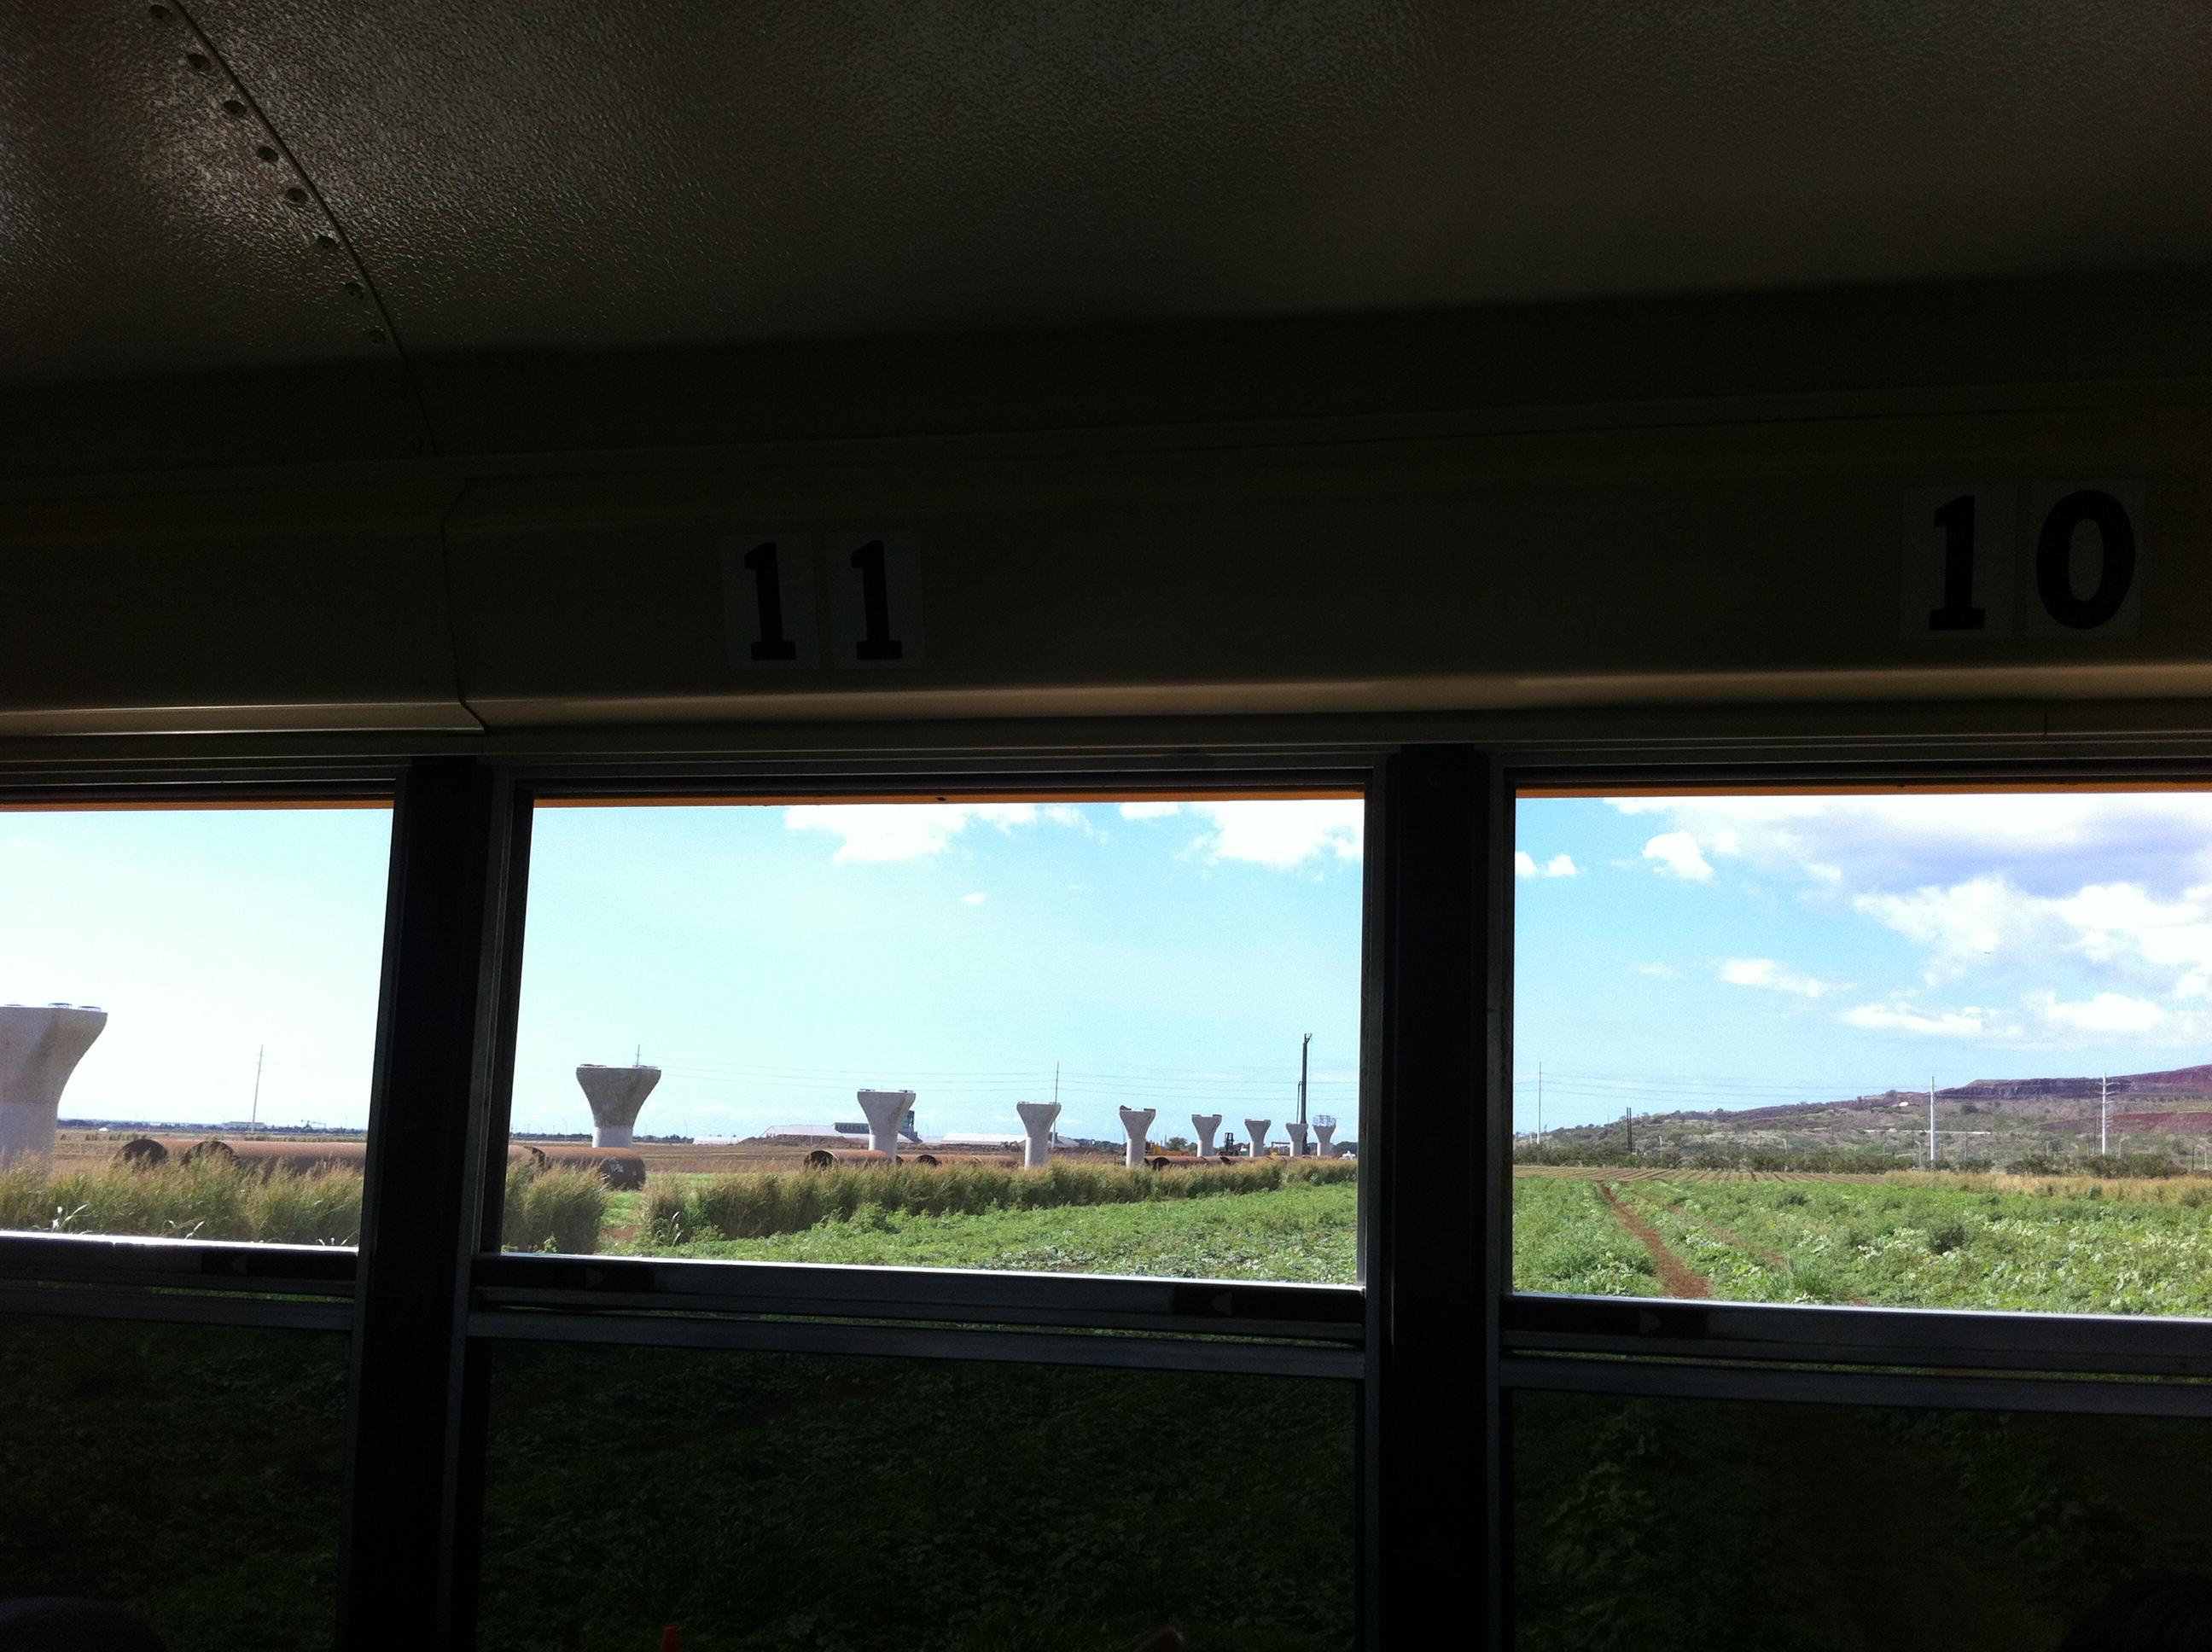 Honolulu Rail Pilings Seen on Ag Land